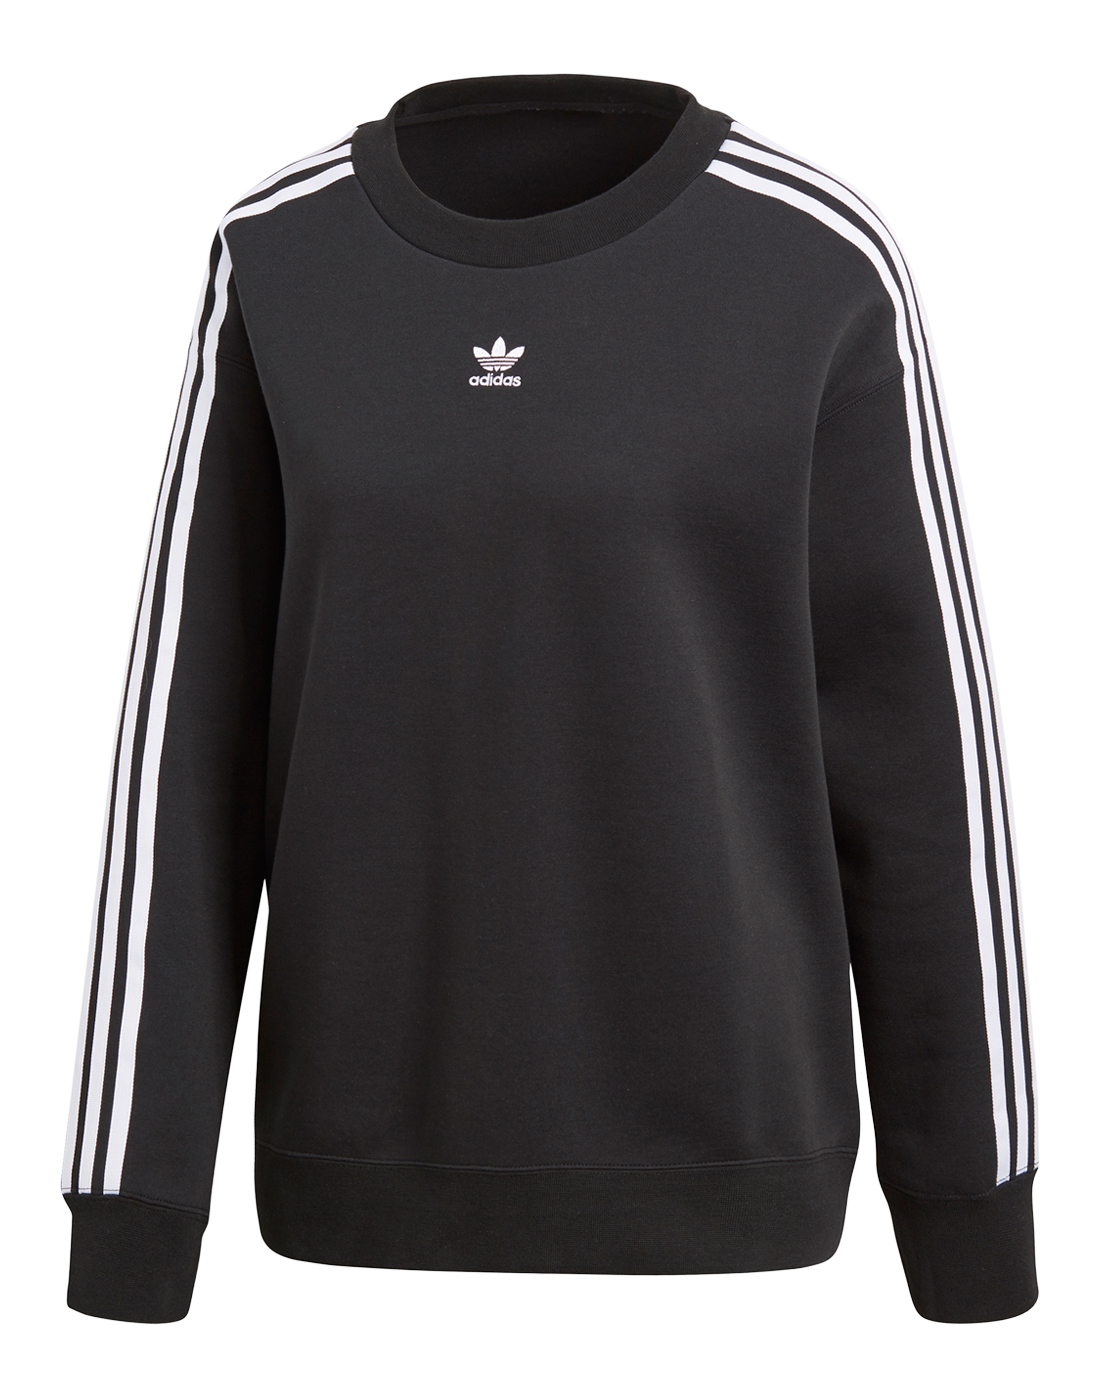 d7a77018021368 adidas Originals. Womens Crew Sweater. Womens Crew Sweater ...